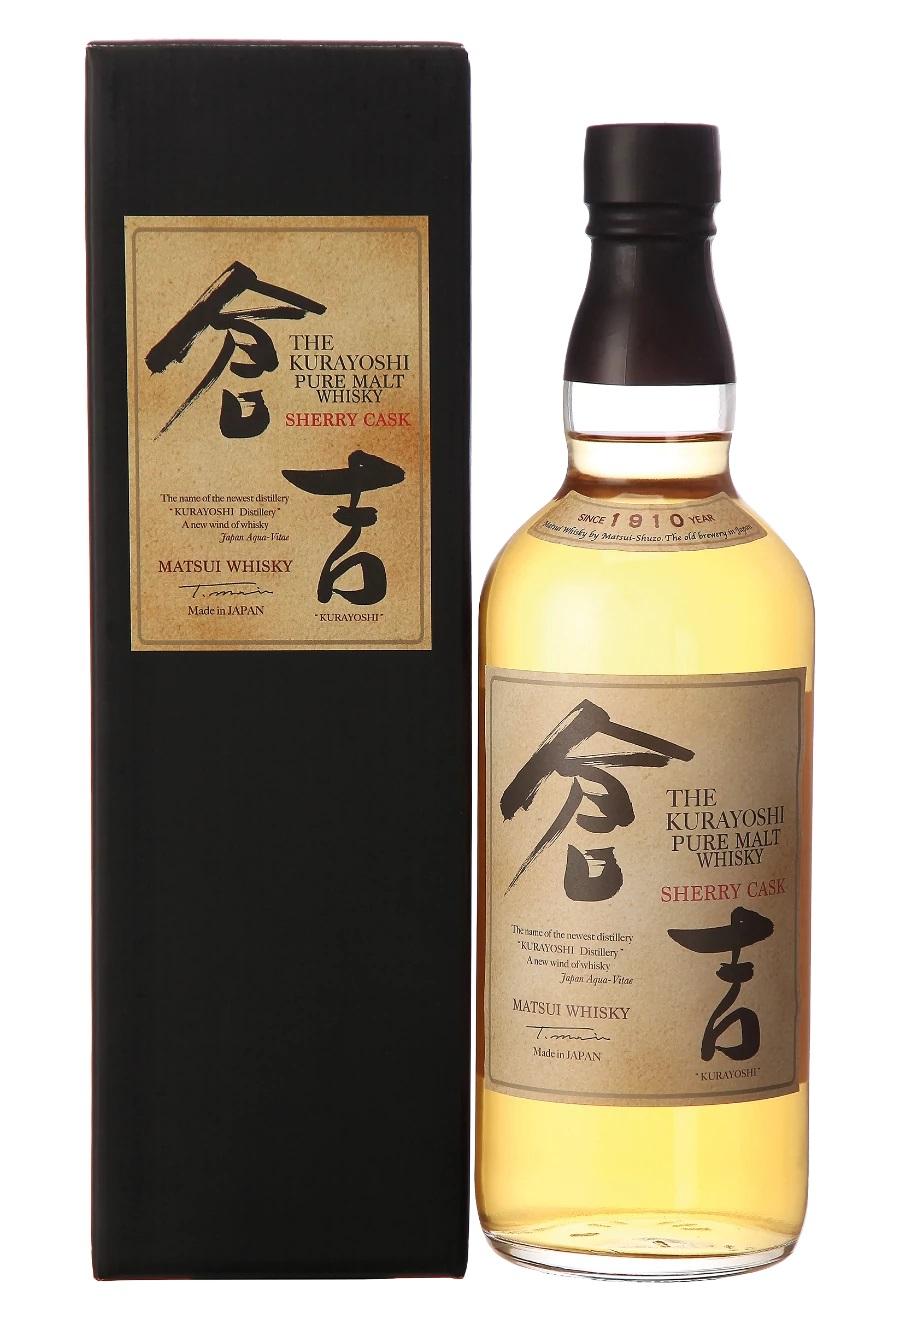 Matsui Whisky Kurayoshi Sherry Cask Japanese Whisky, 43%, 0,7l